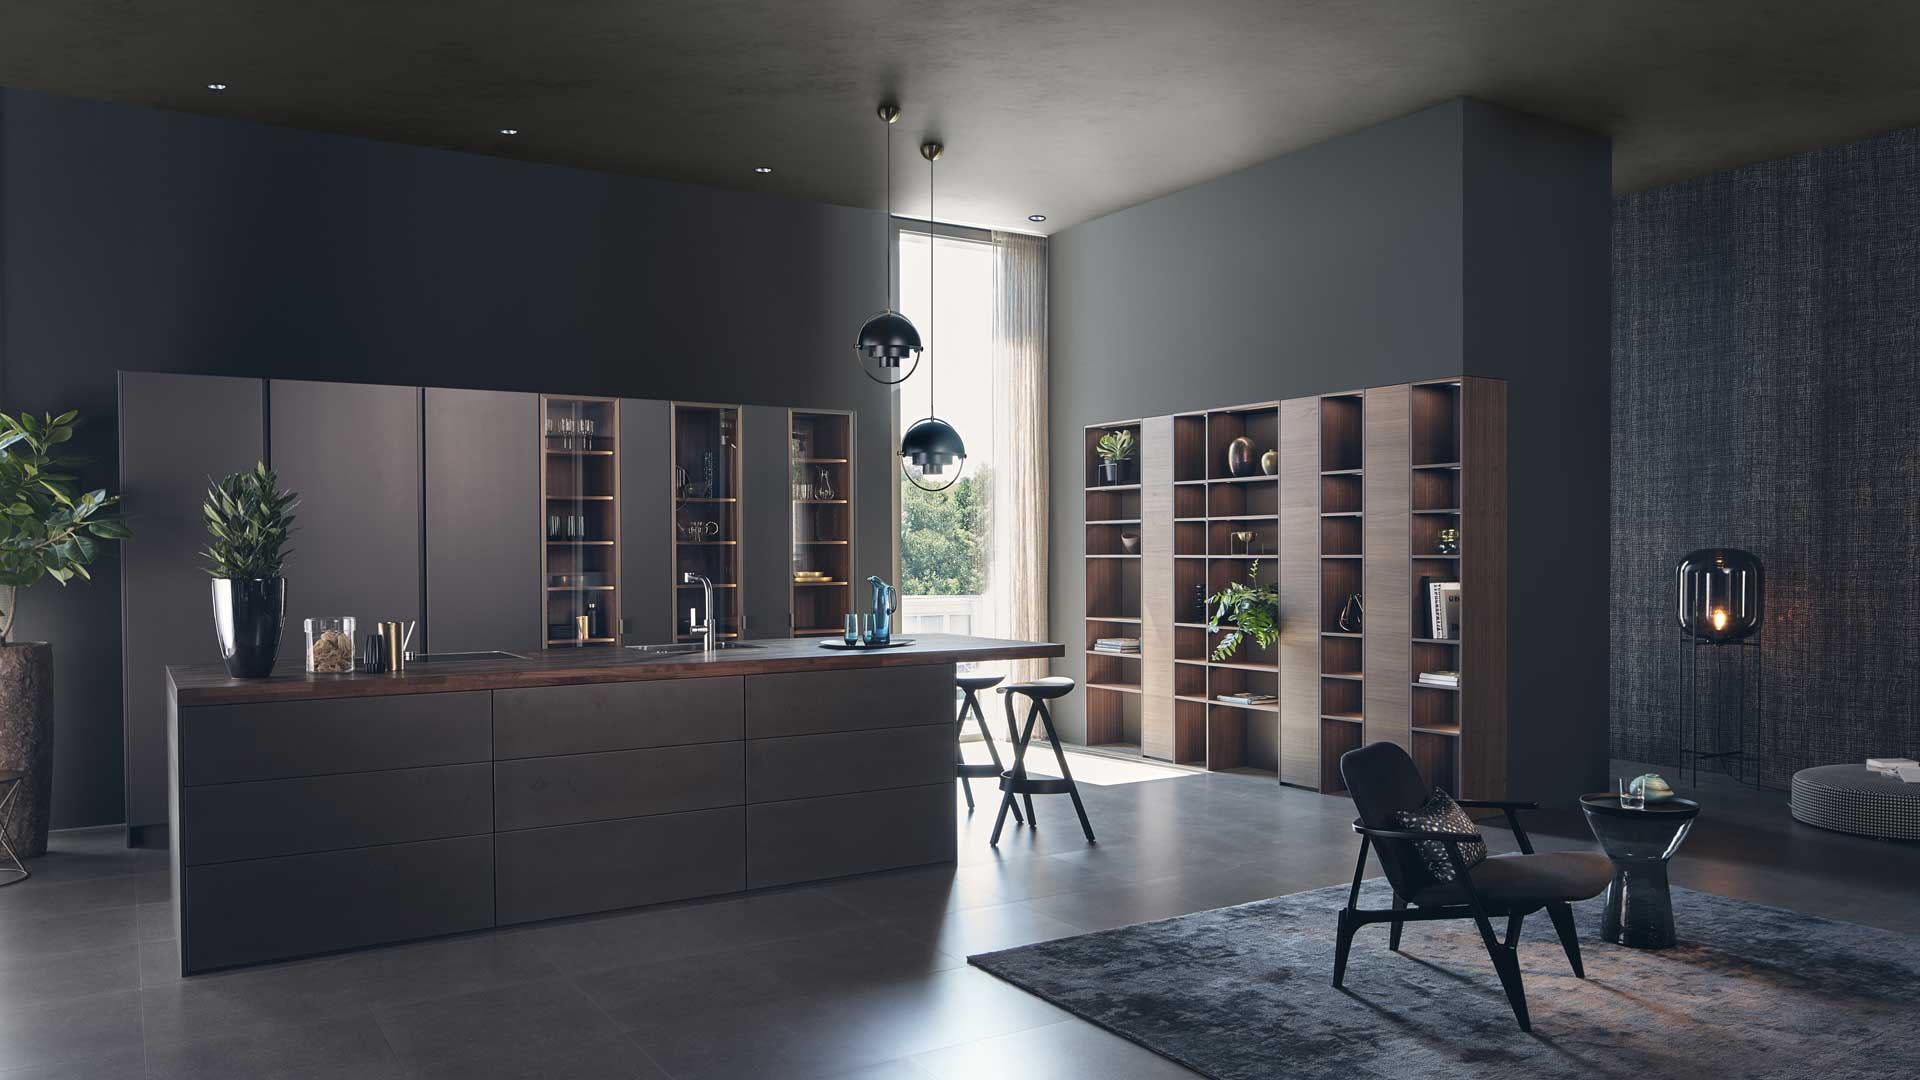 Cocina Steel | Classic-FS | Topos